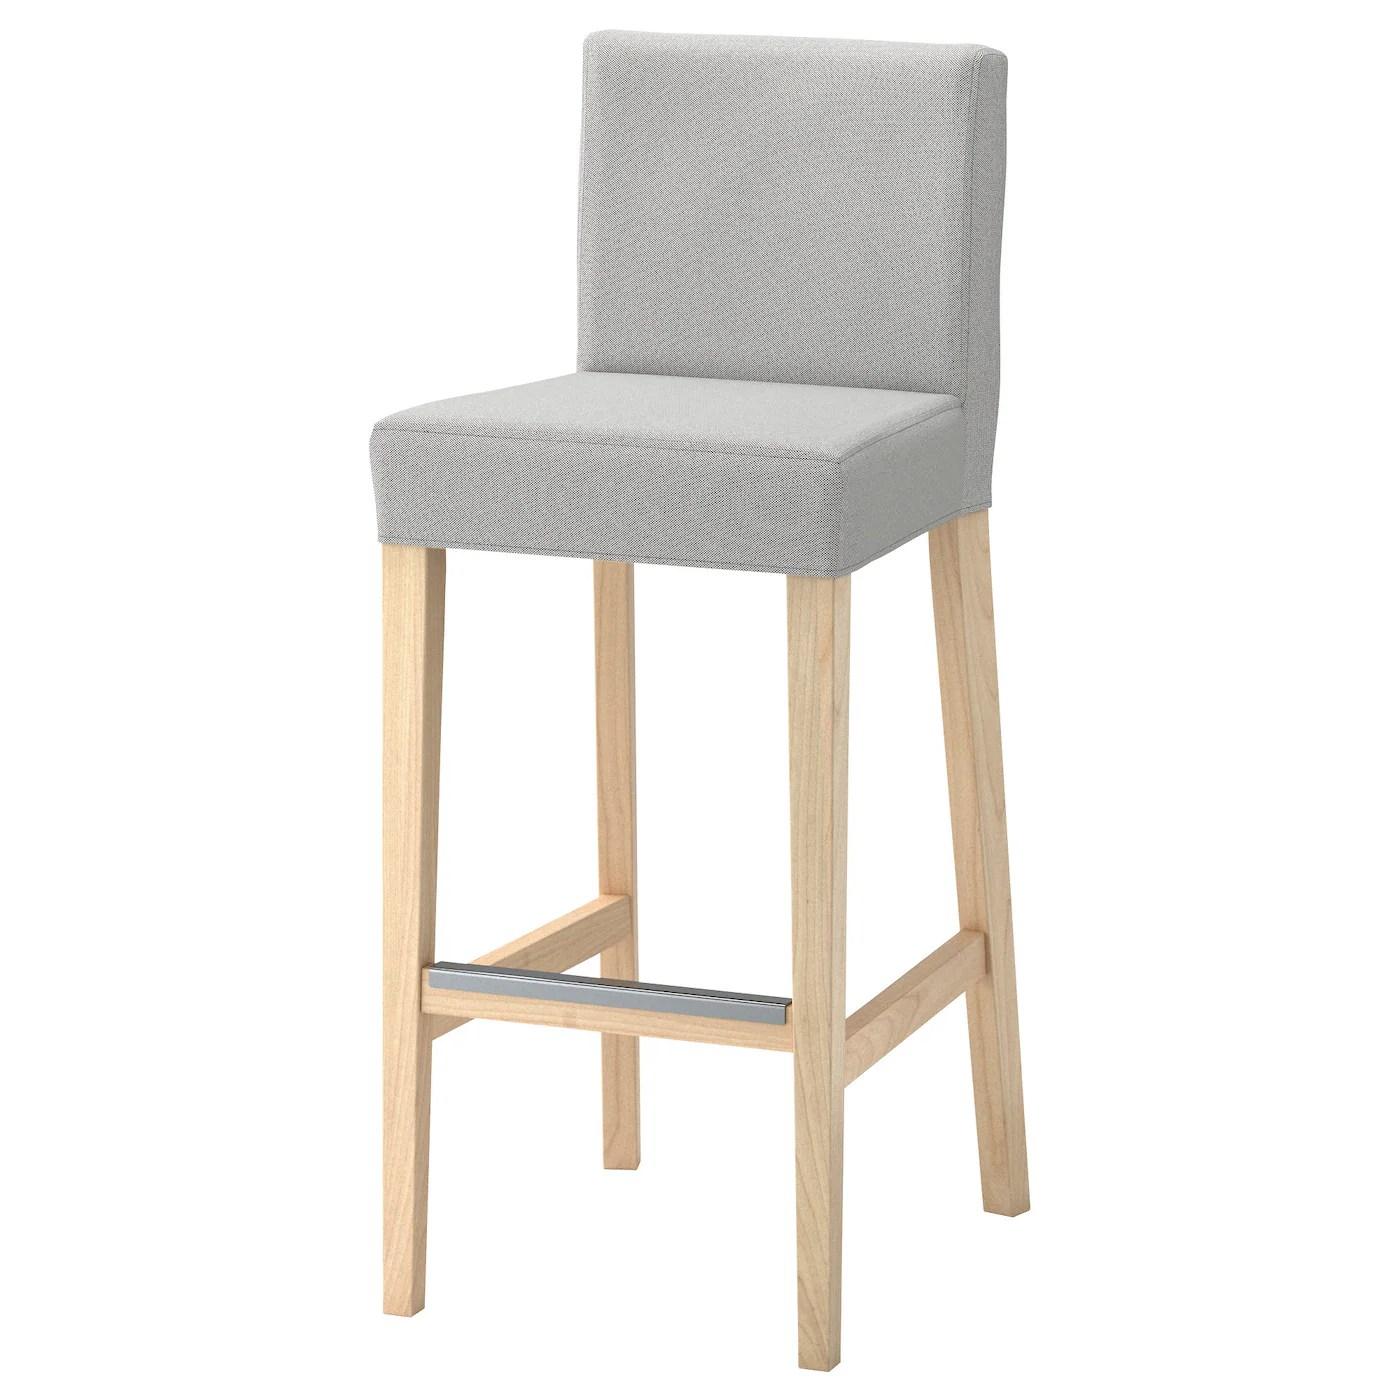 ikea bar chair margaritaville beach chairs henriksdal stool with backrest birch ramna light grey